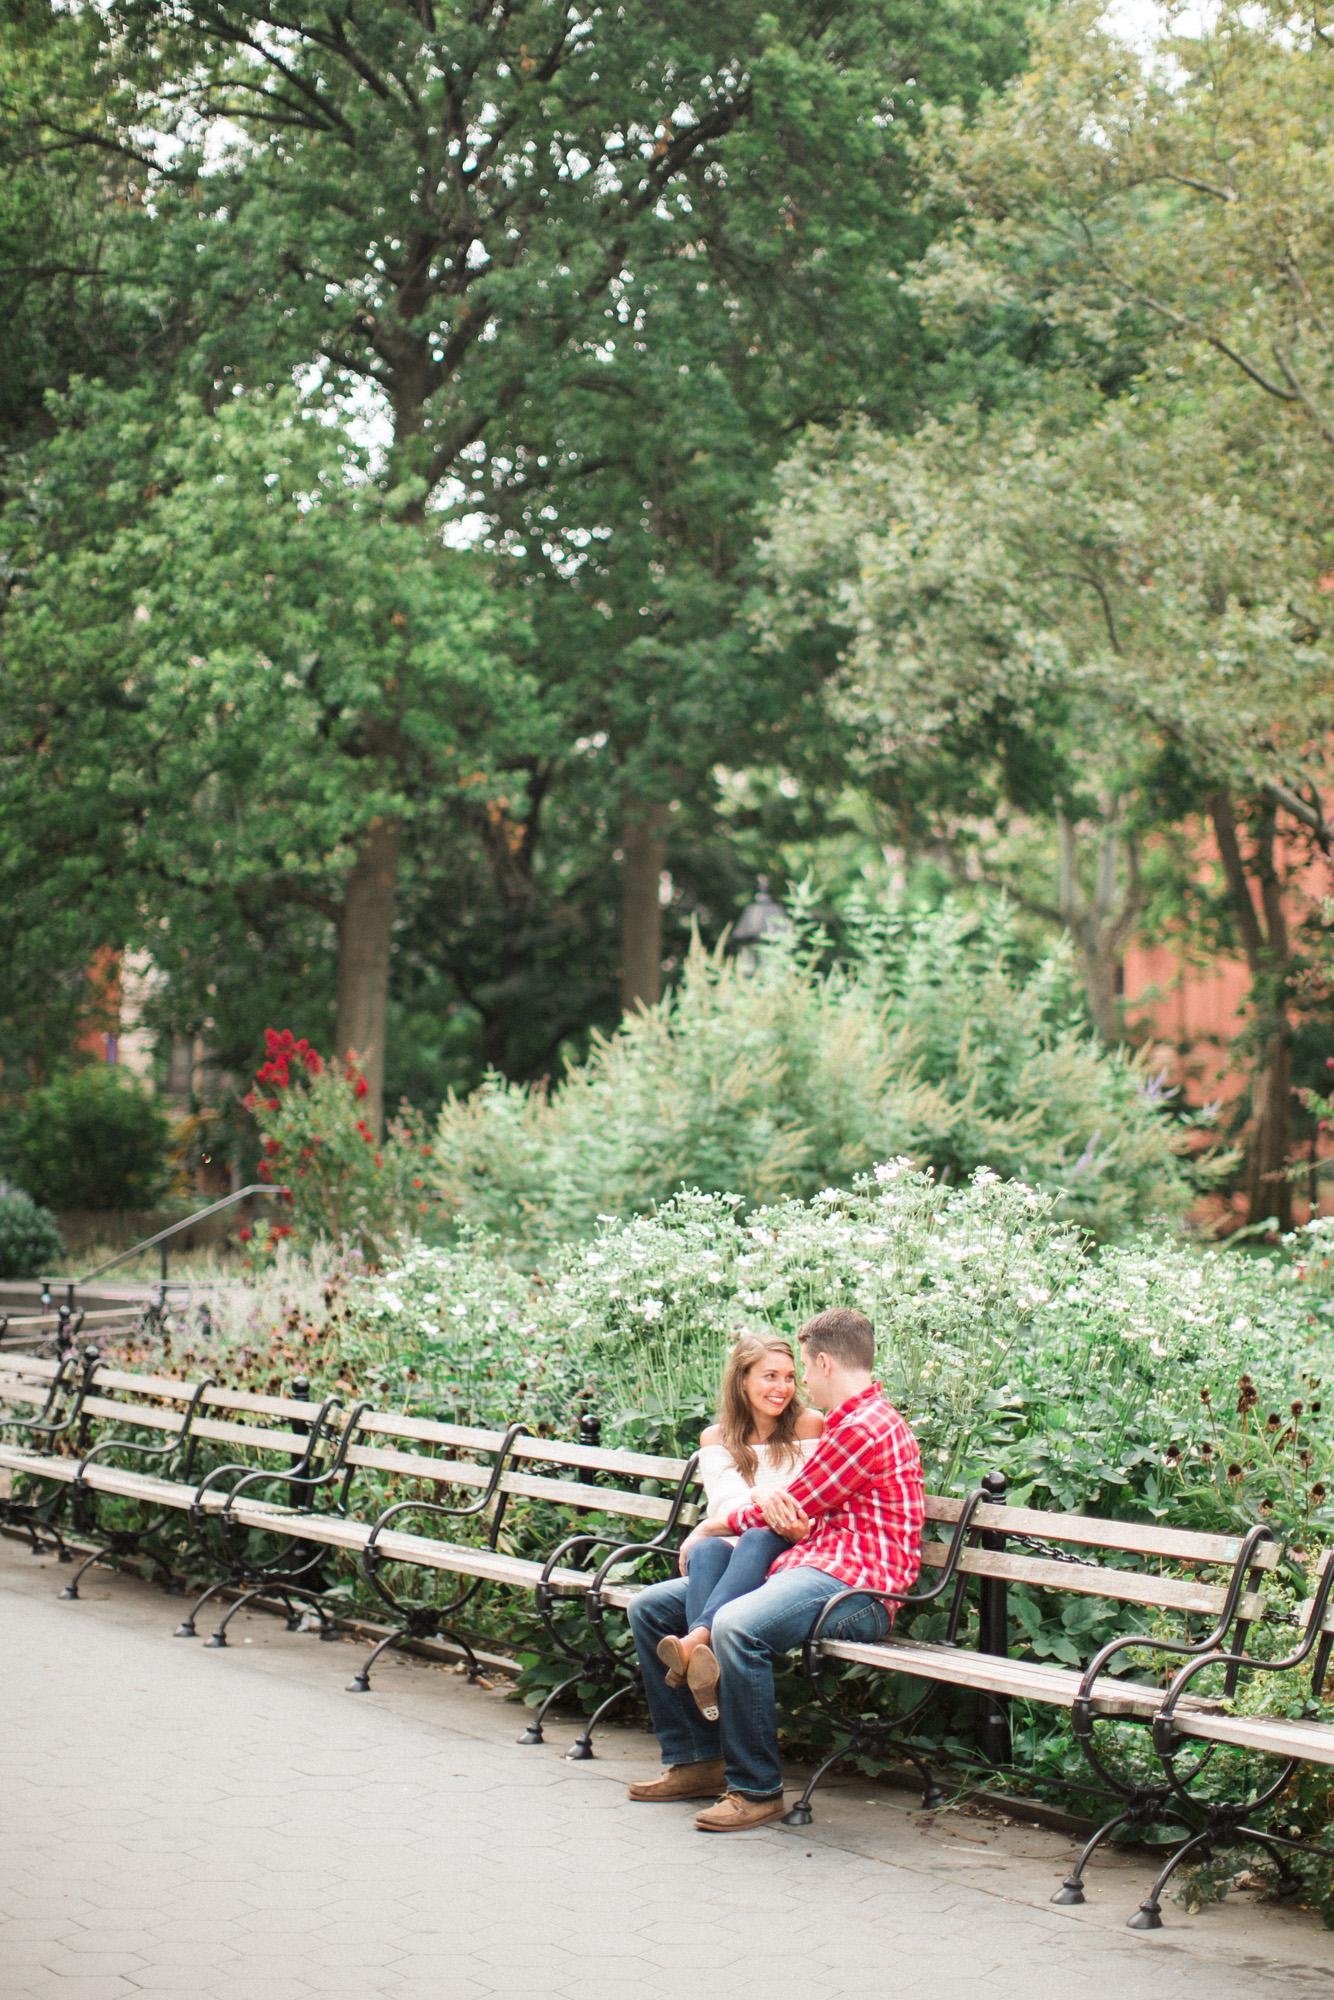 new-york-city-wedding-photography-hunter-ryan-photo-05206.jpg